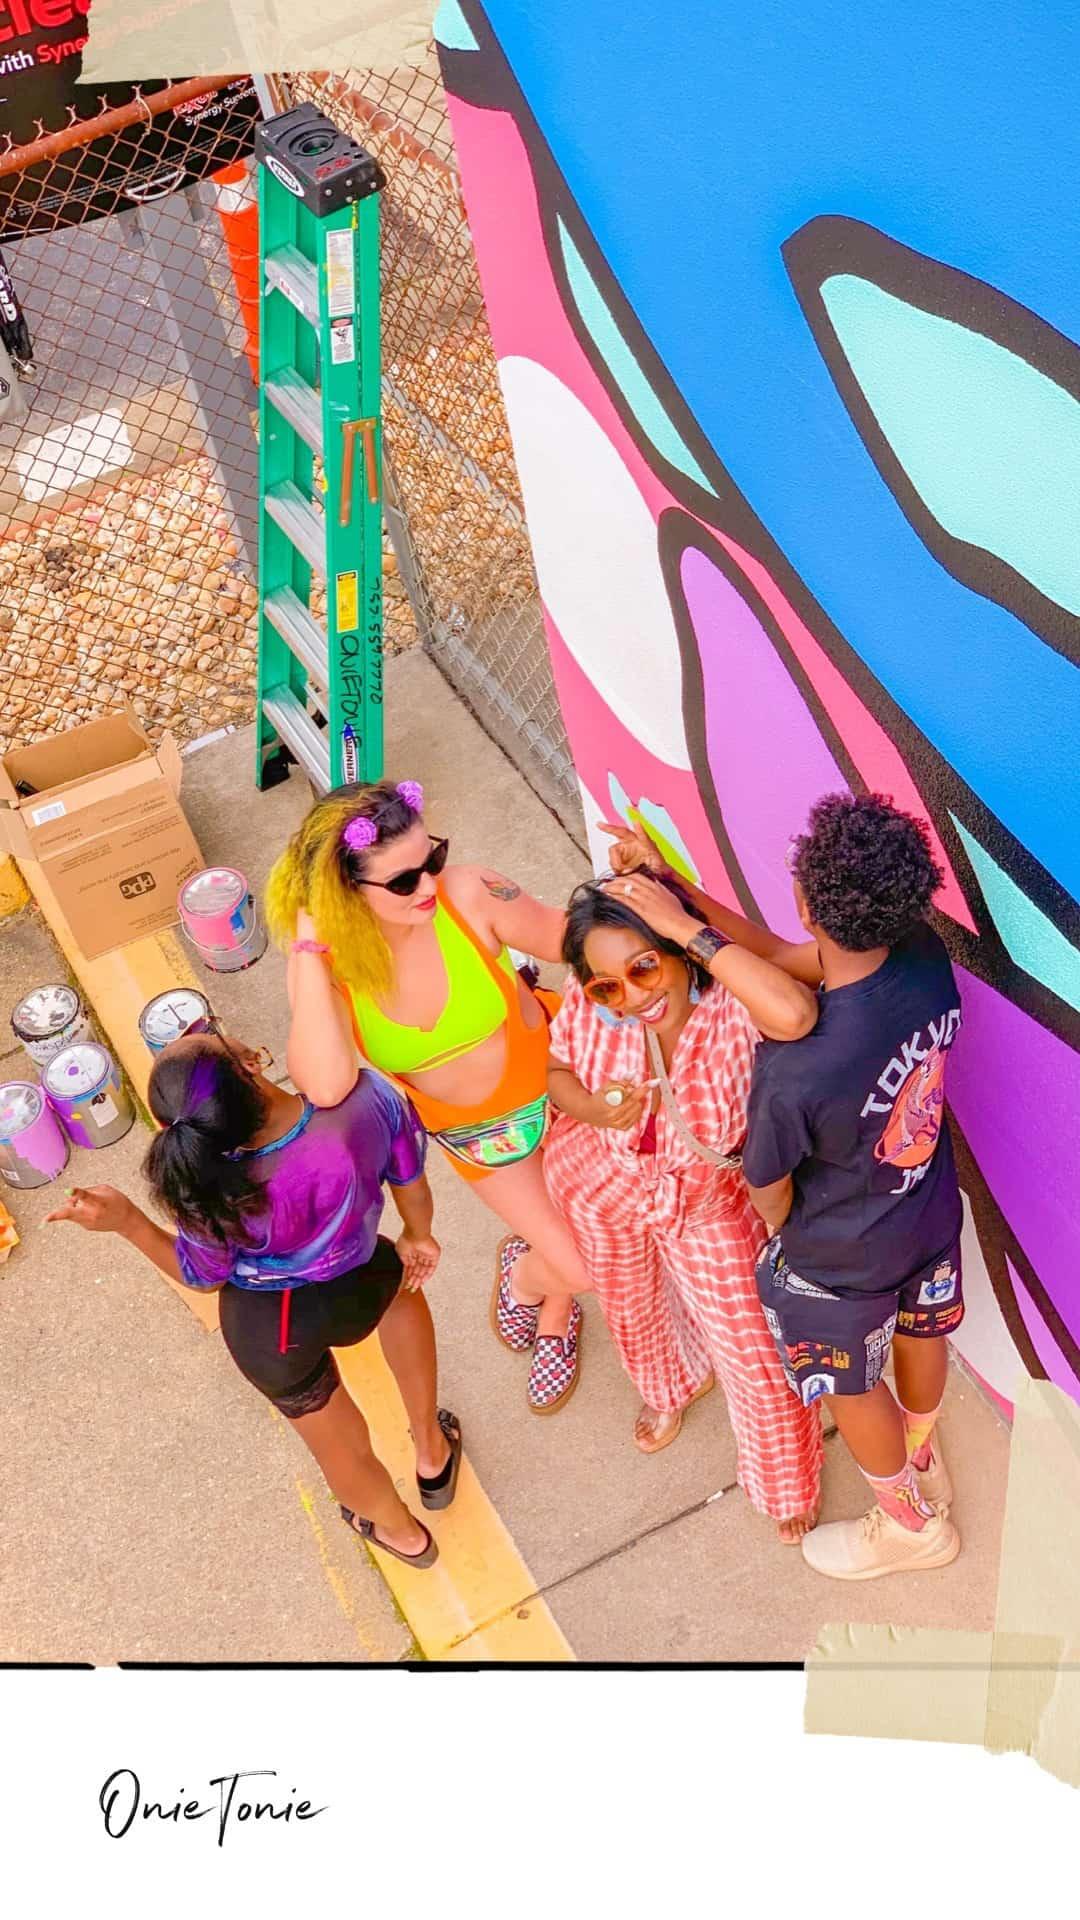 ShaundaNecole.com Something In The Water Fest- BTS Onie Tonie artist mural